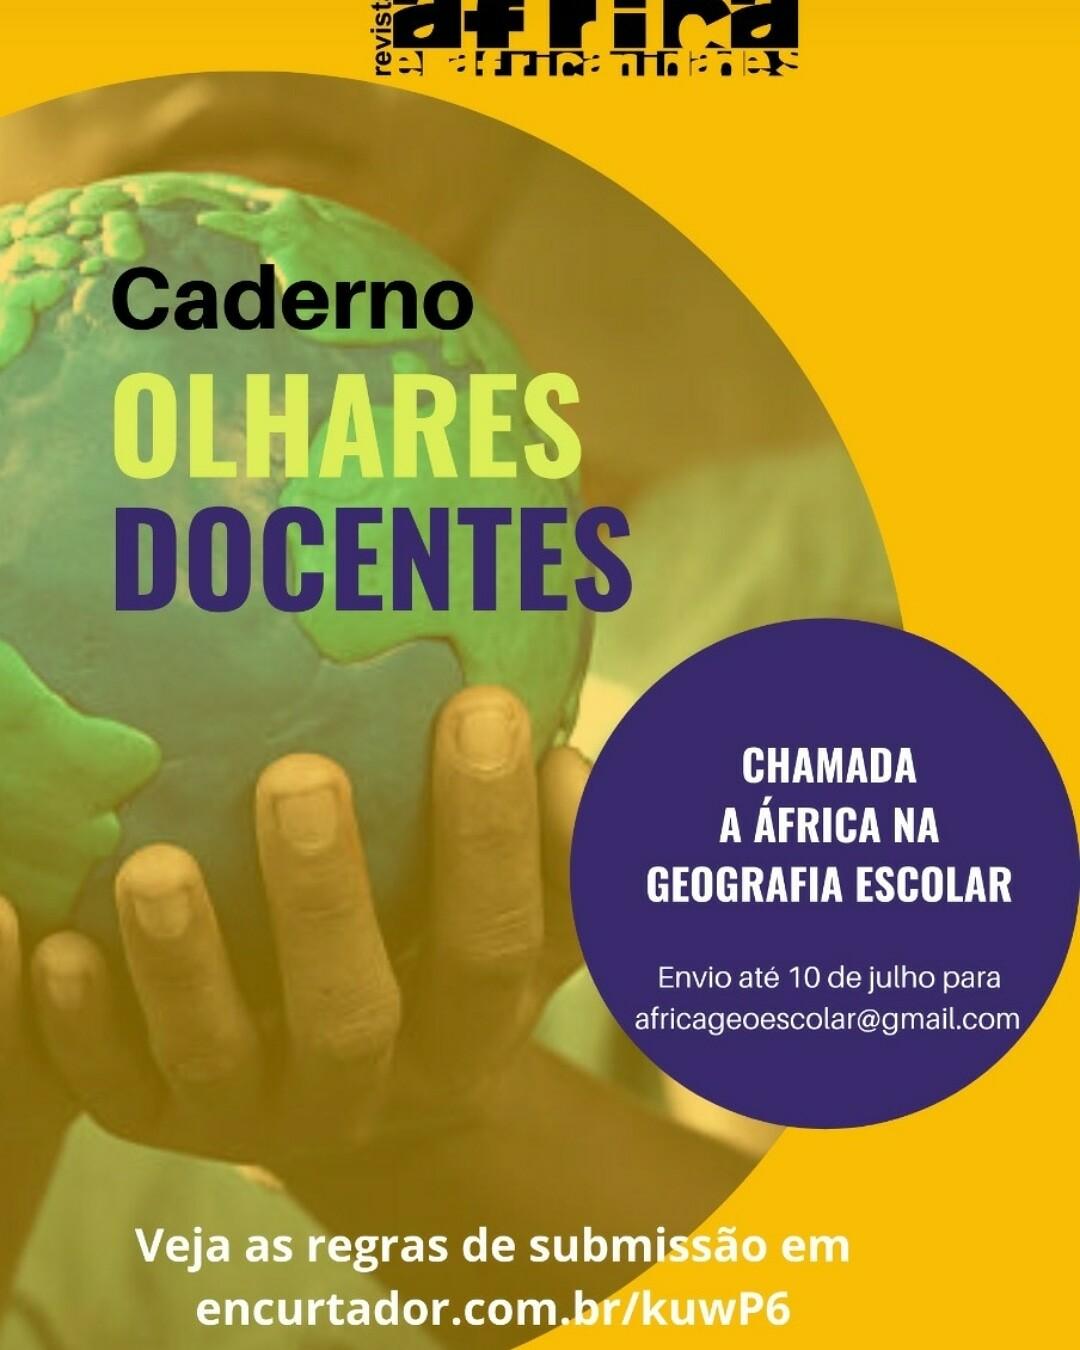 cartaz ChamadaAfricaGeoEscolar